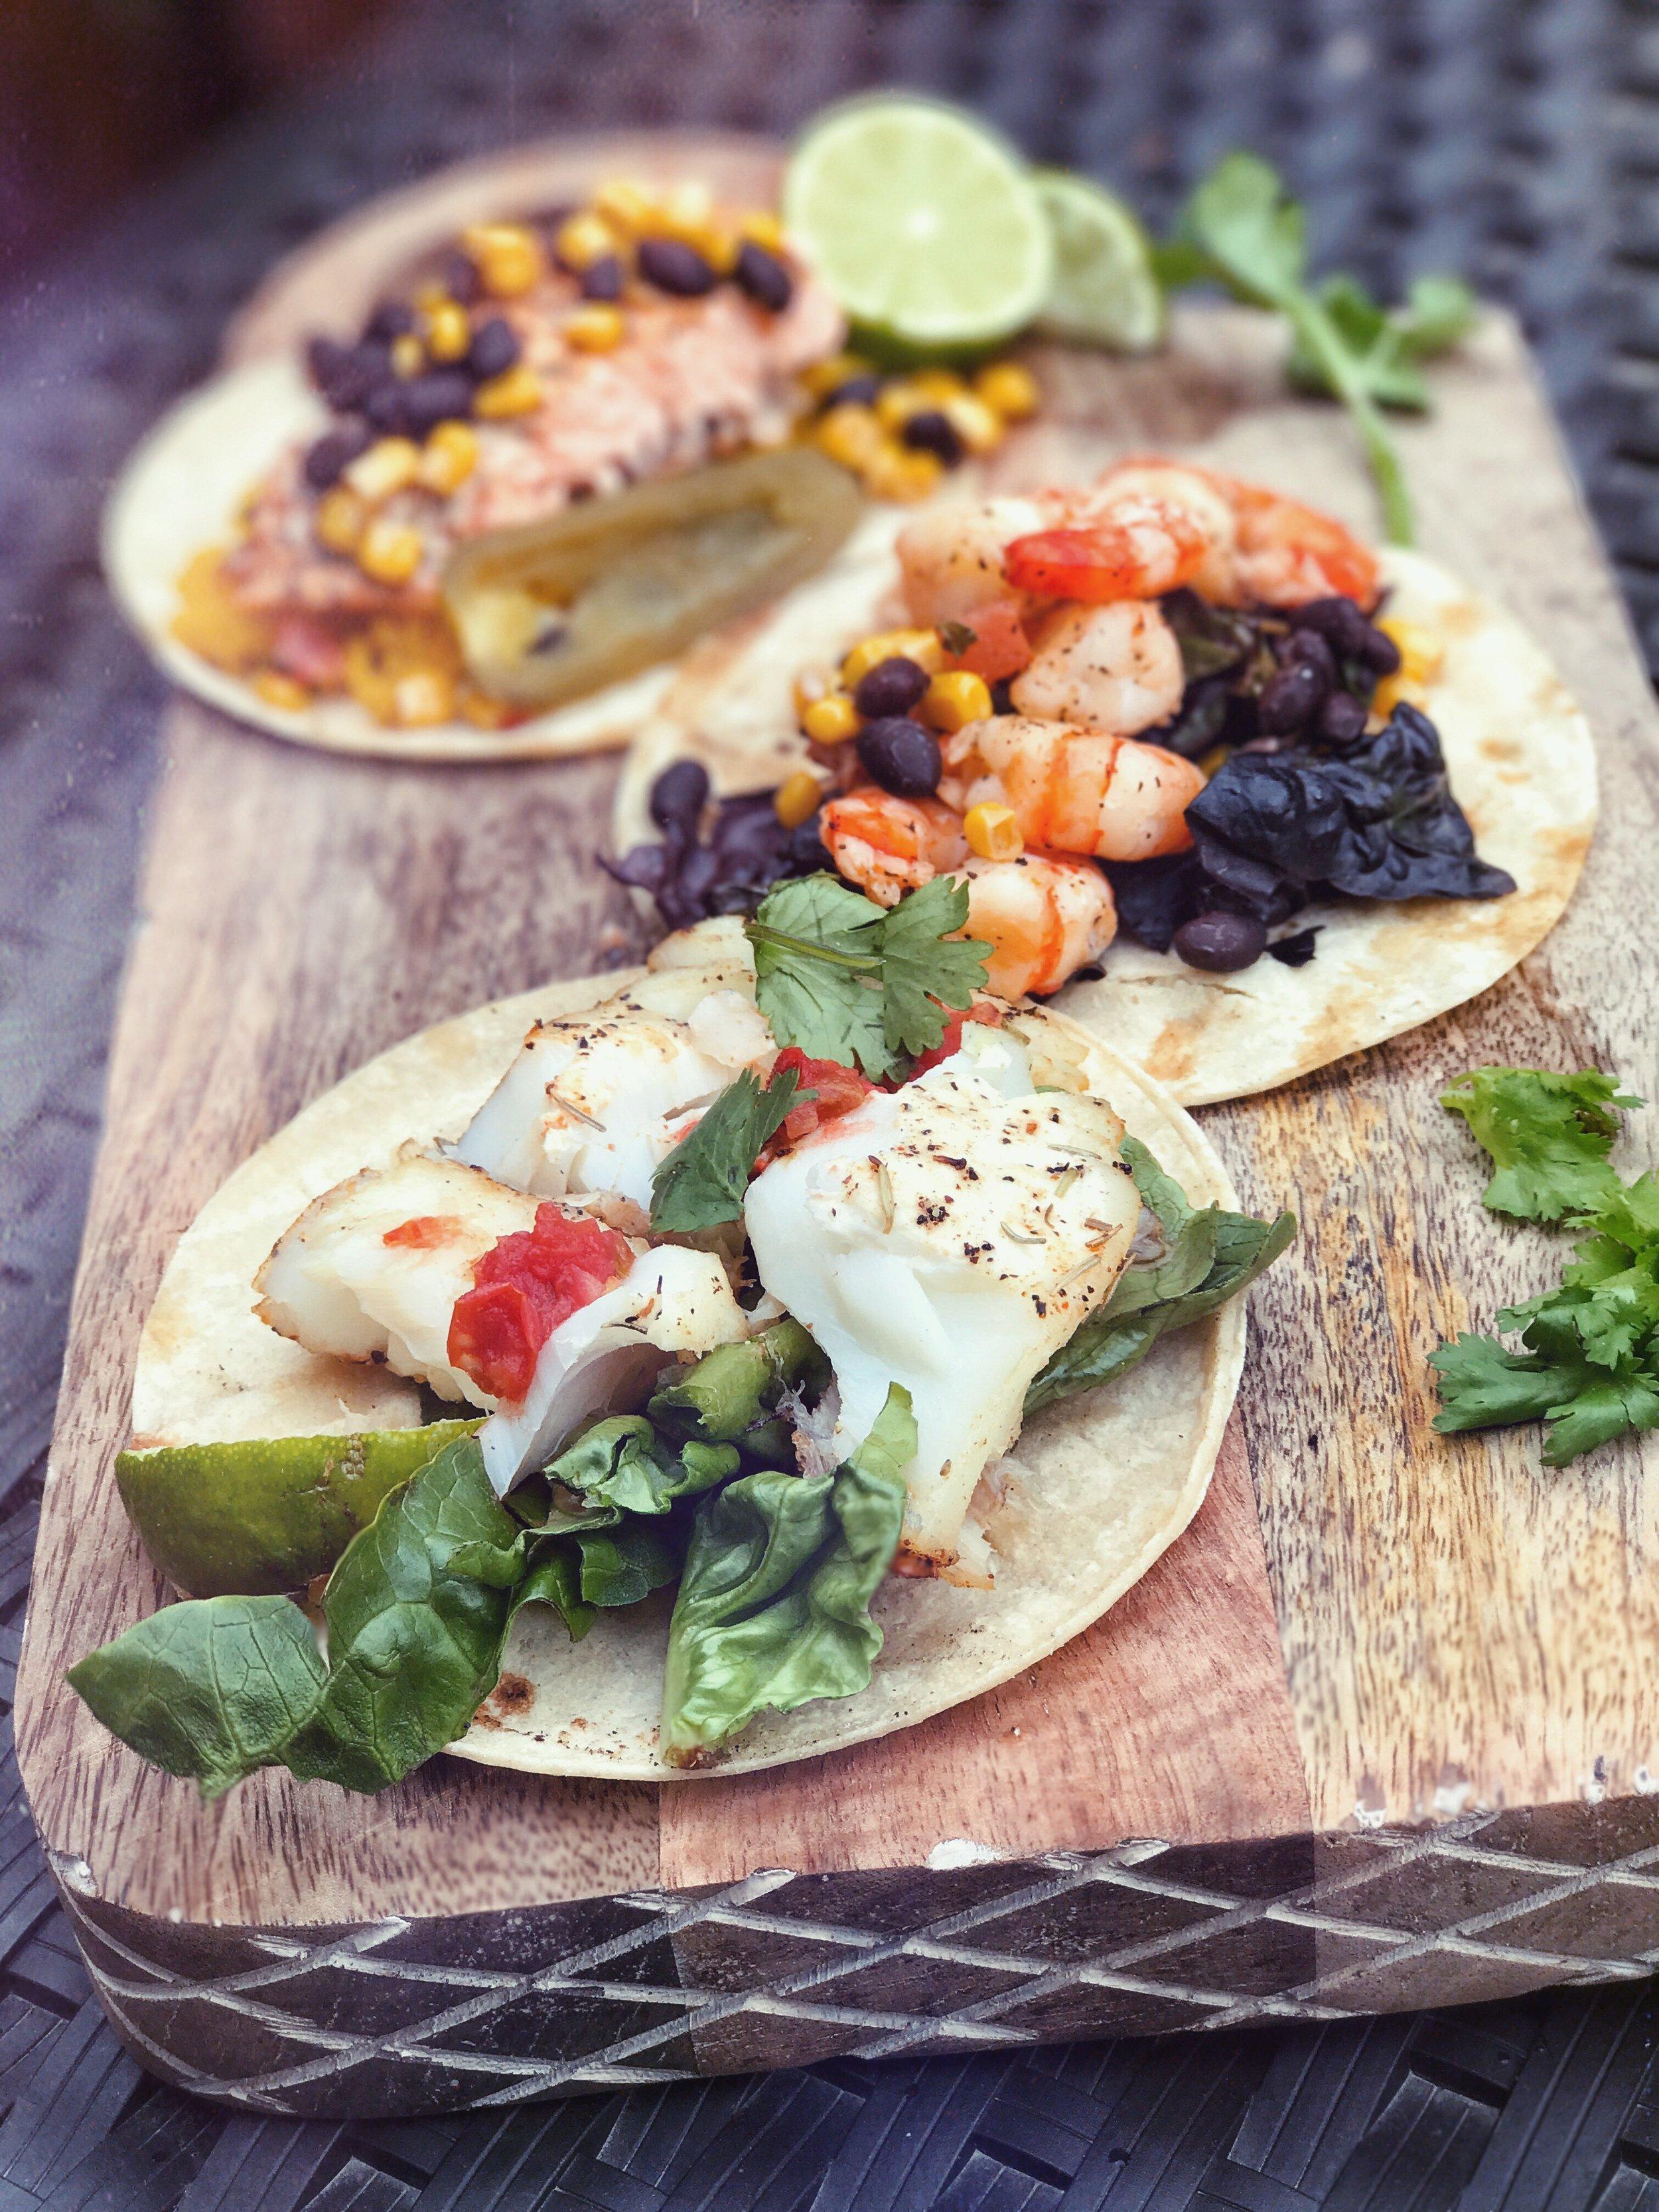 Grilled Seaside Buffet - Shrimp NachosFish TacosStrawberry Limeade Margarita